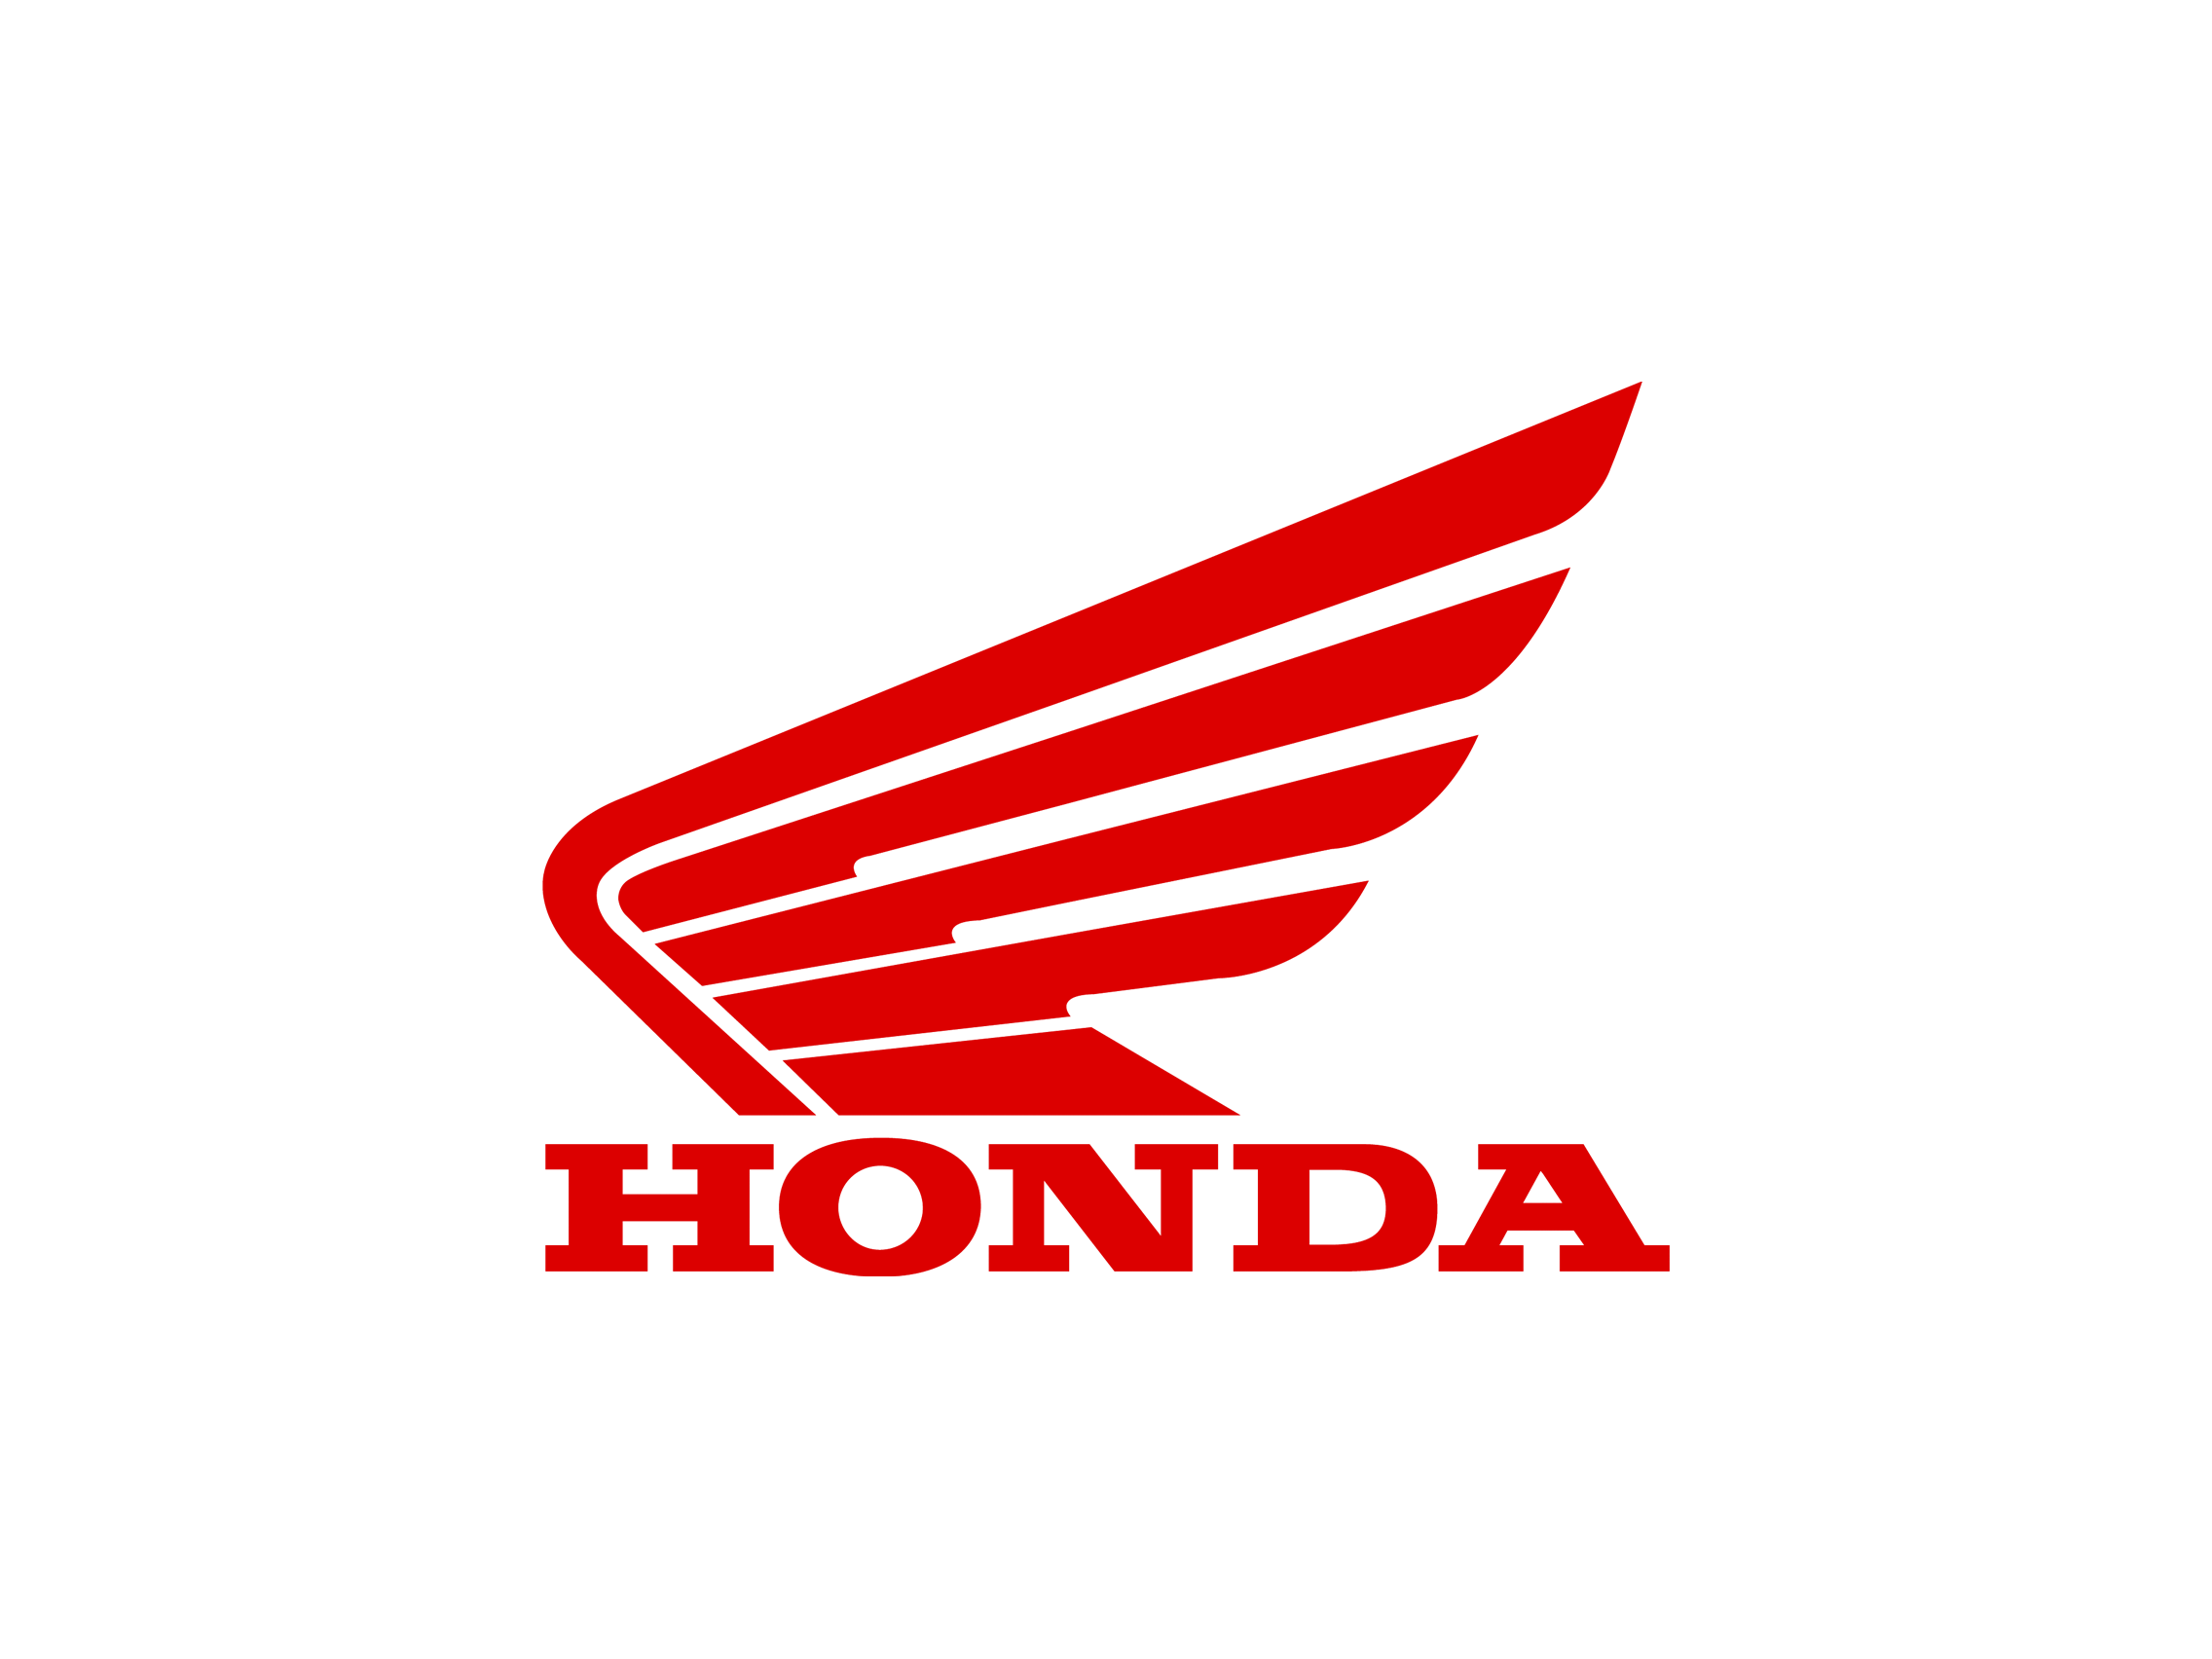 honda logo transparent png pictures free icons and png. Black Bedroom Furniture Sets. Home Design Ideas